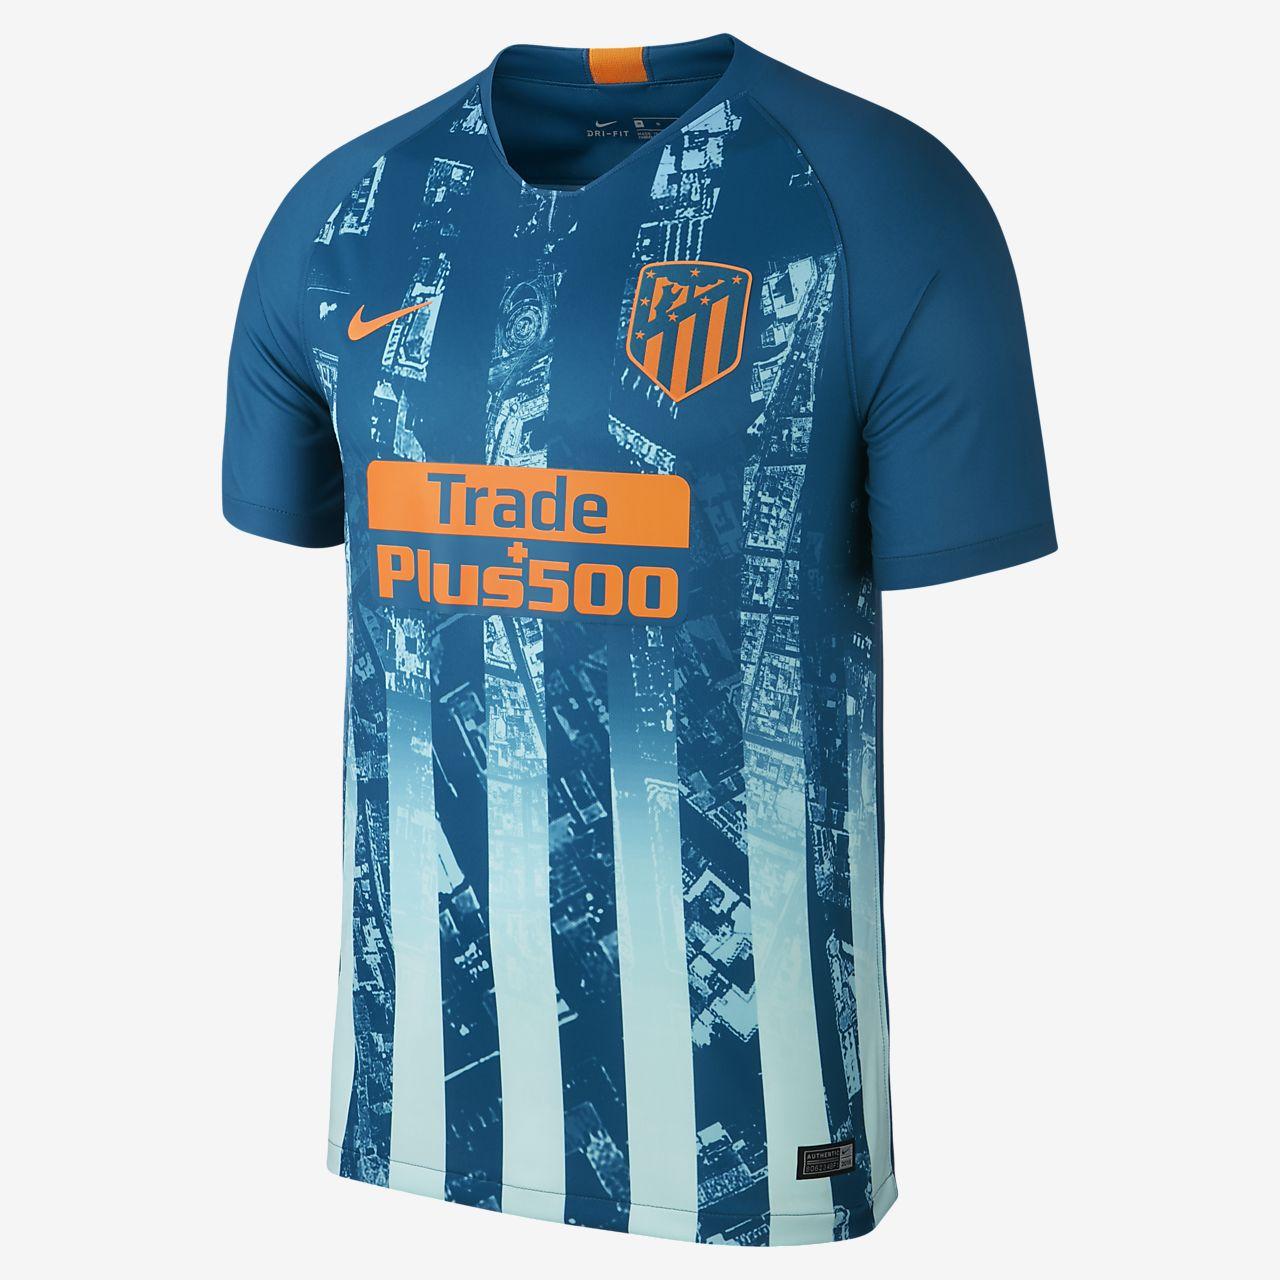 Camiseta de fútbol para hombre alternativa Stadium del Atlético de Madrid 2018/19